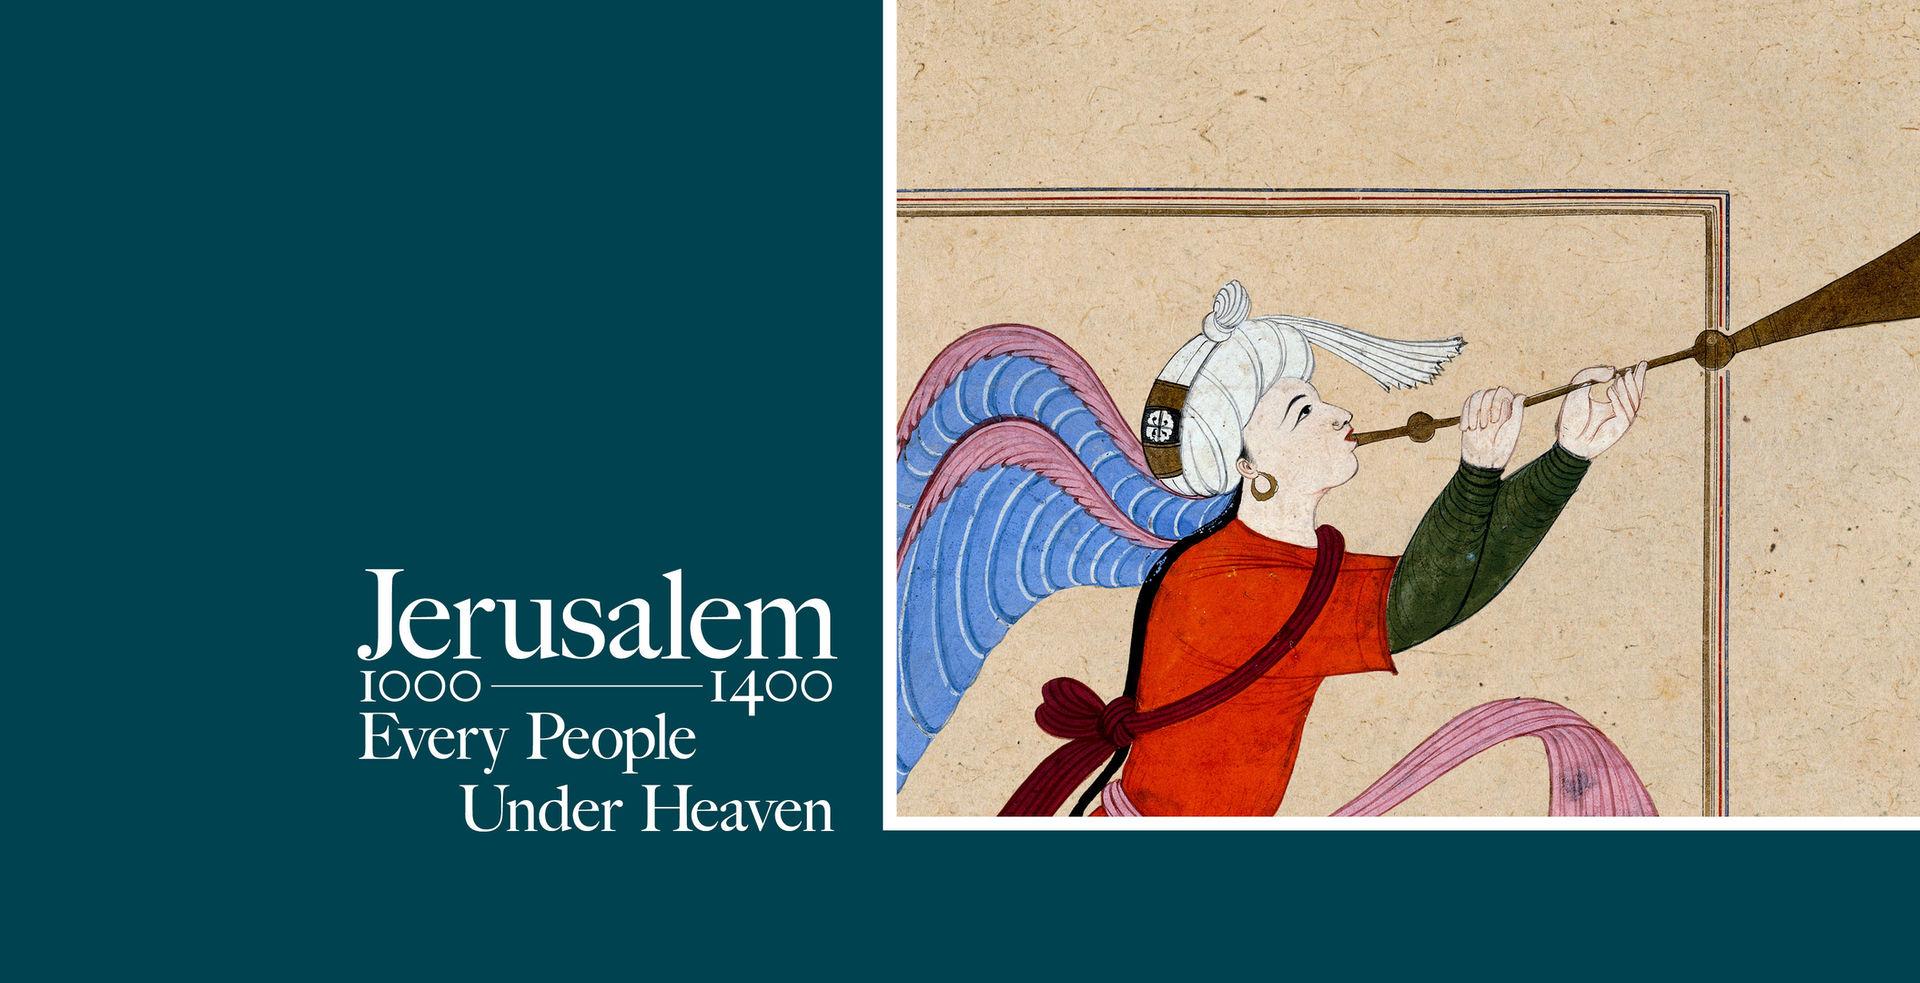 Risultati immagini per http://www.metmuseum.org/exhibitions/listings/2016/jerusalem